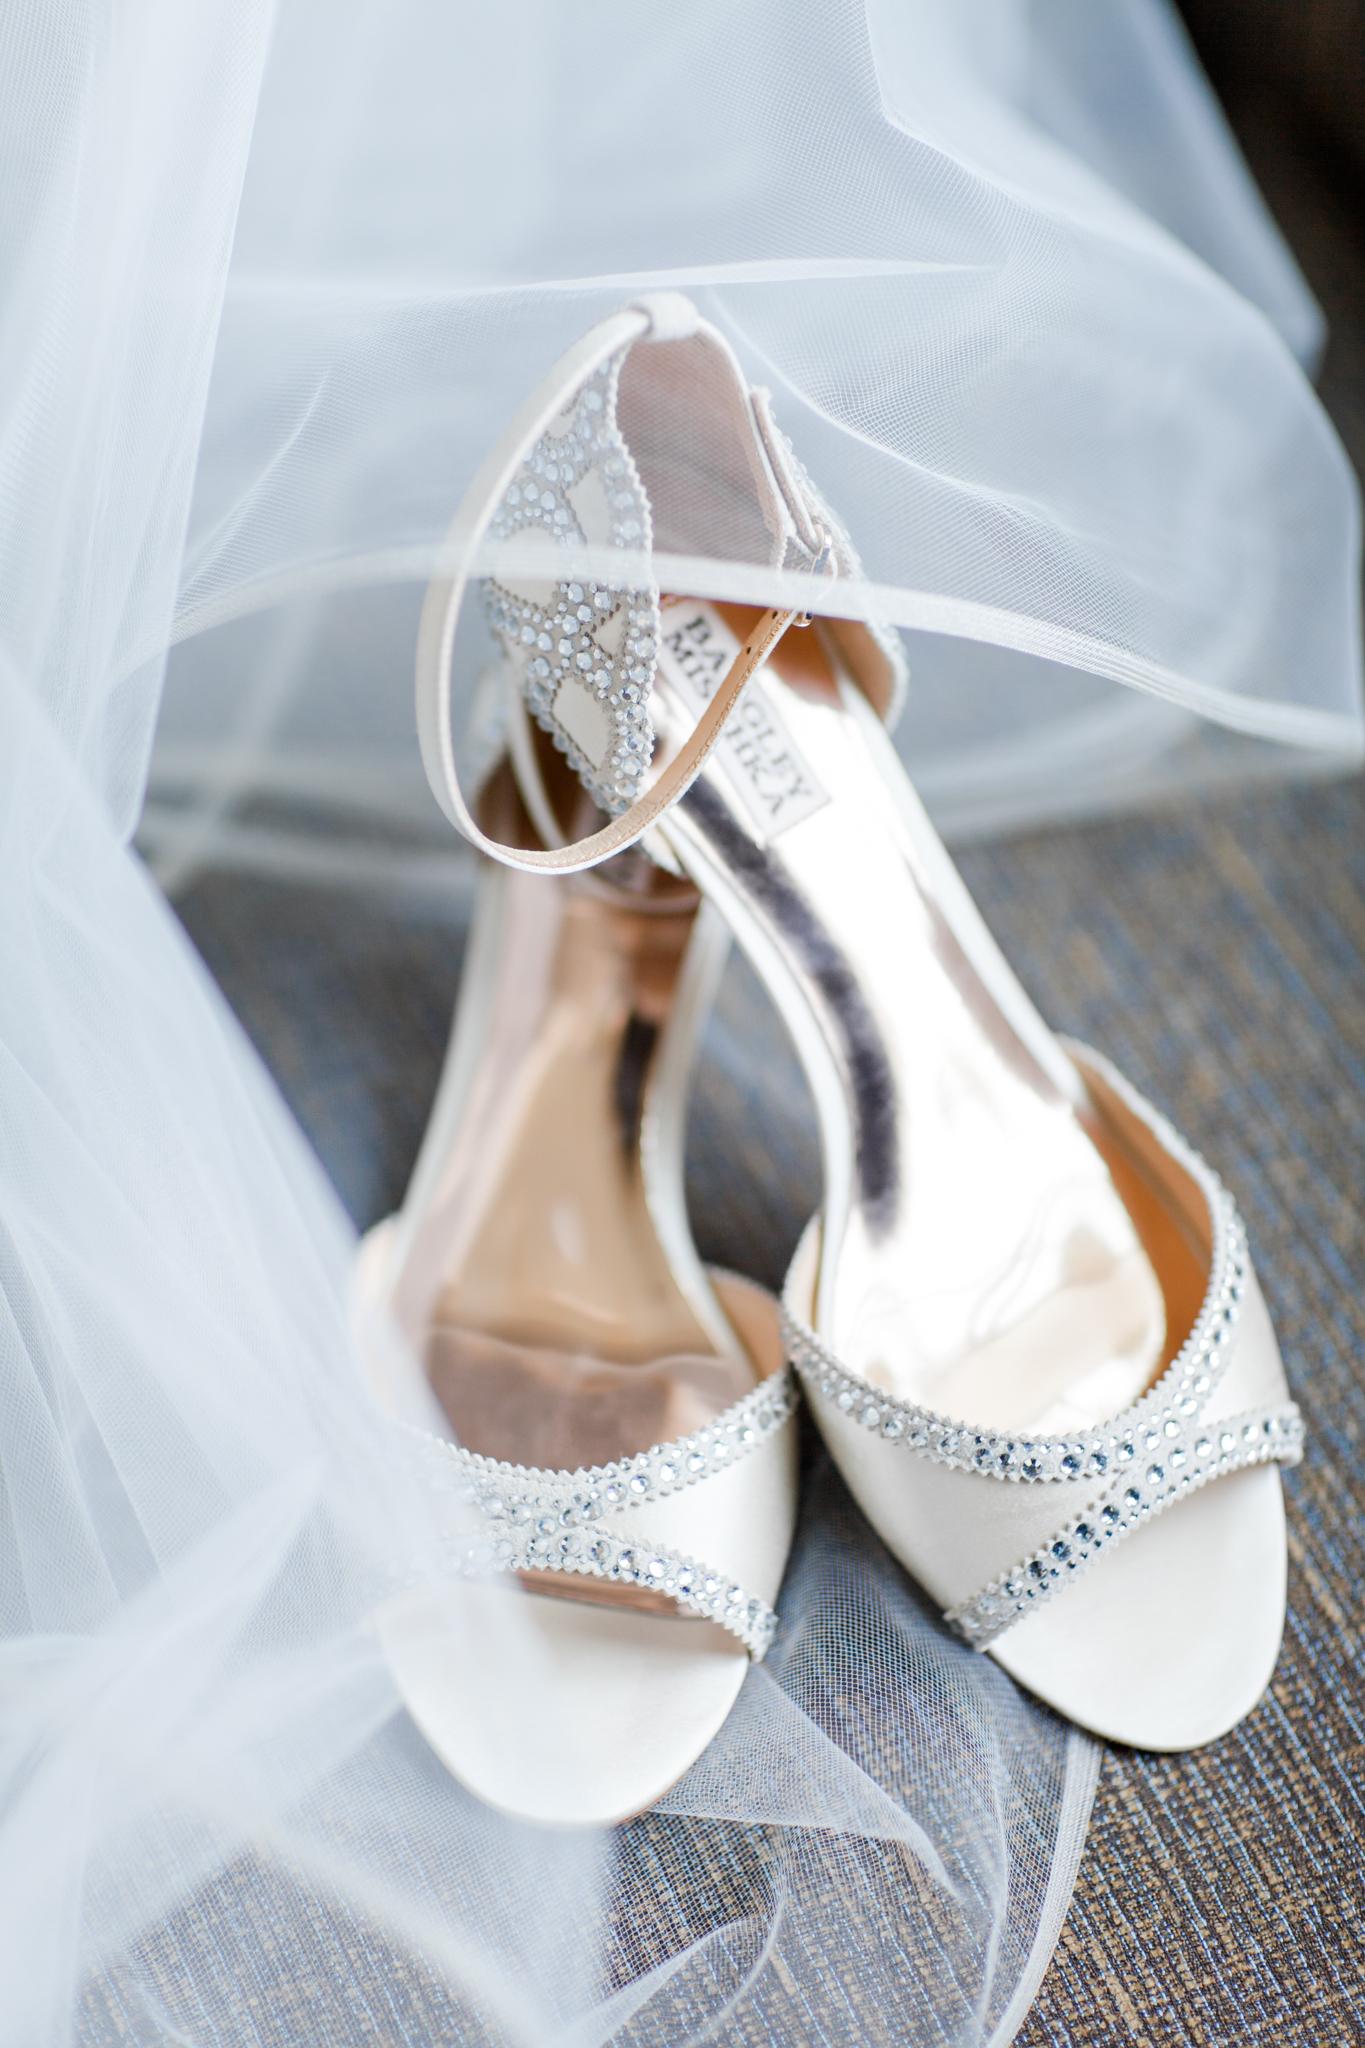 Badgley Mischka Bridal Shoes | details shot | Jessa Anderson Photography | Sixpence Events & Planning wedding blog | Hyatt Place St Paul